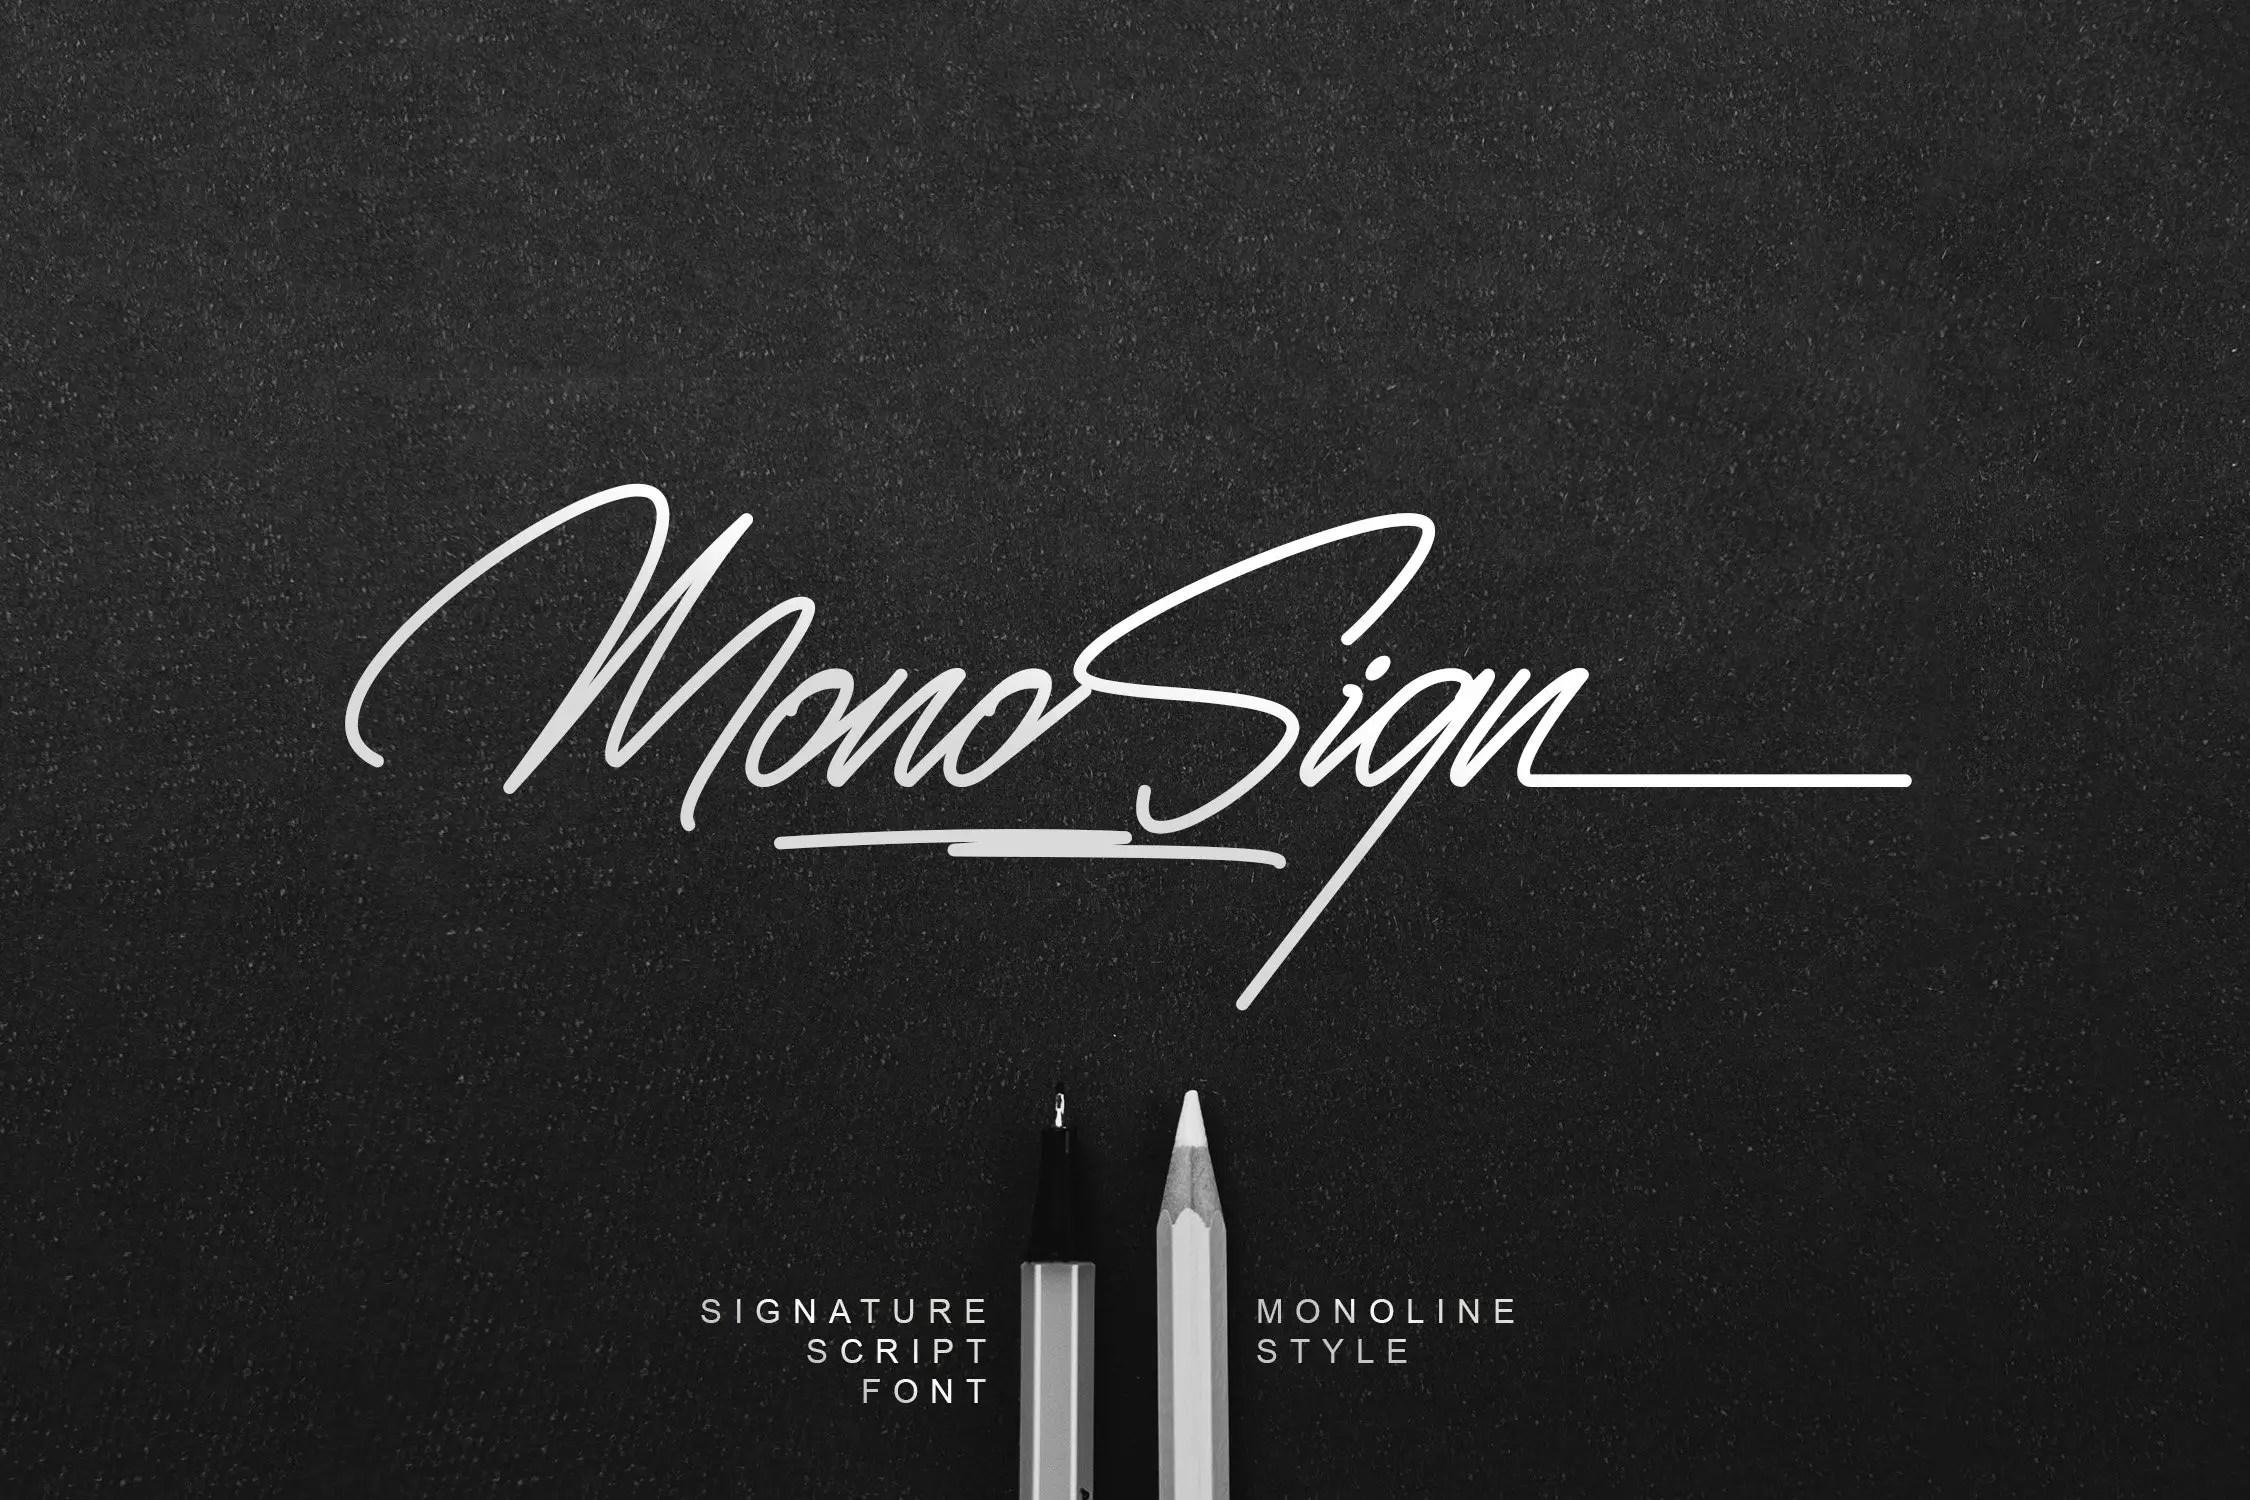 Monosign Beautiful Signature Font -1